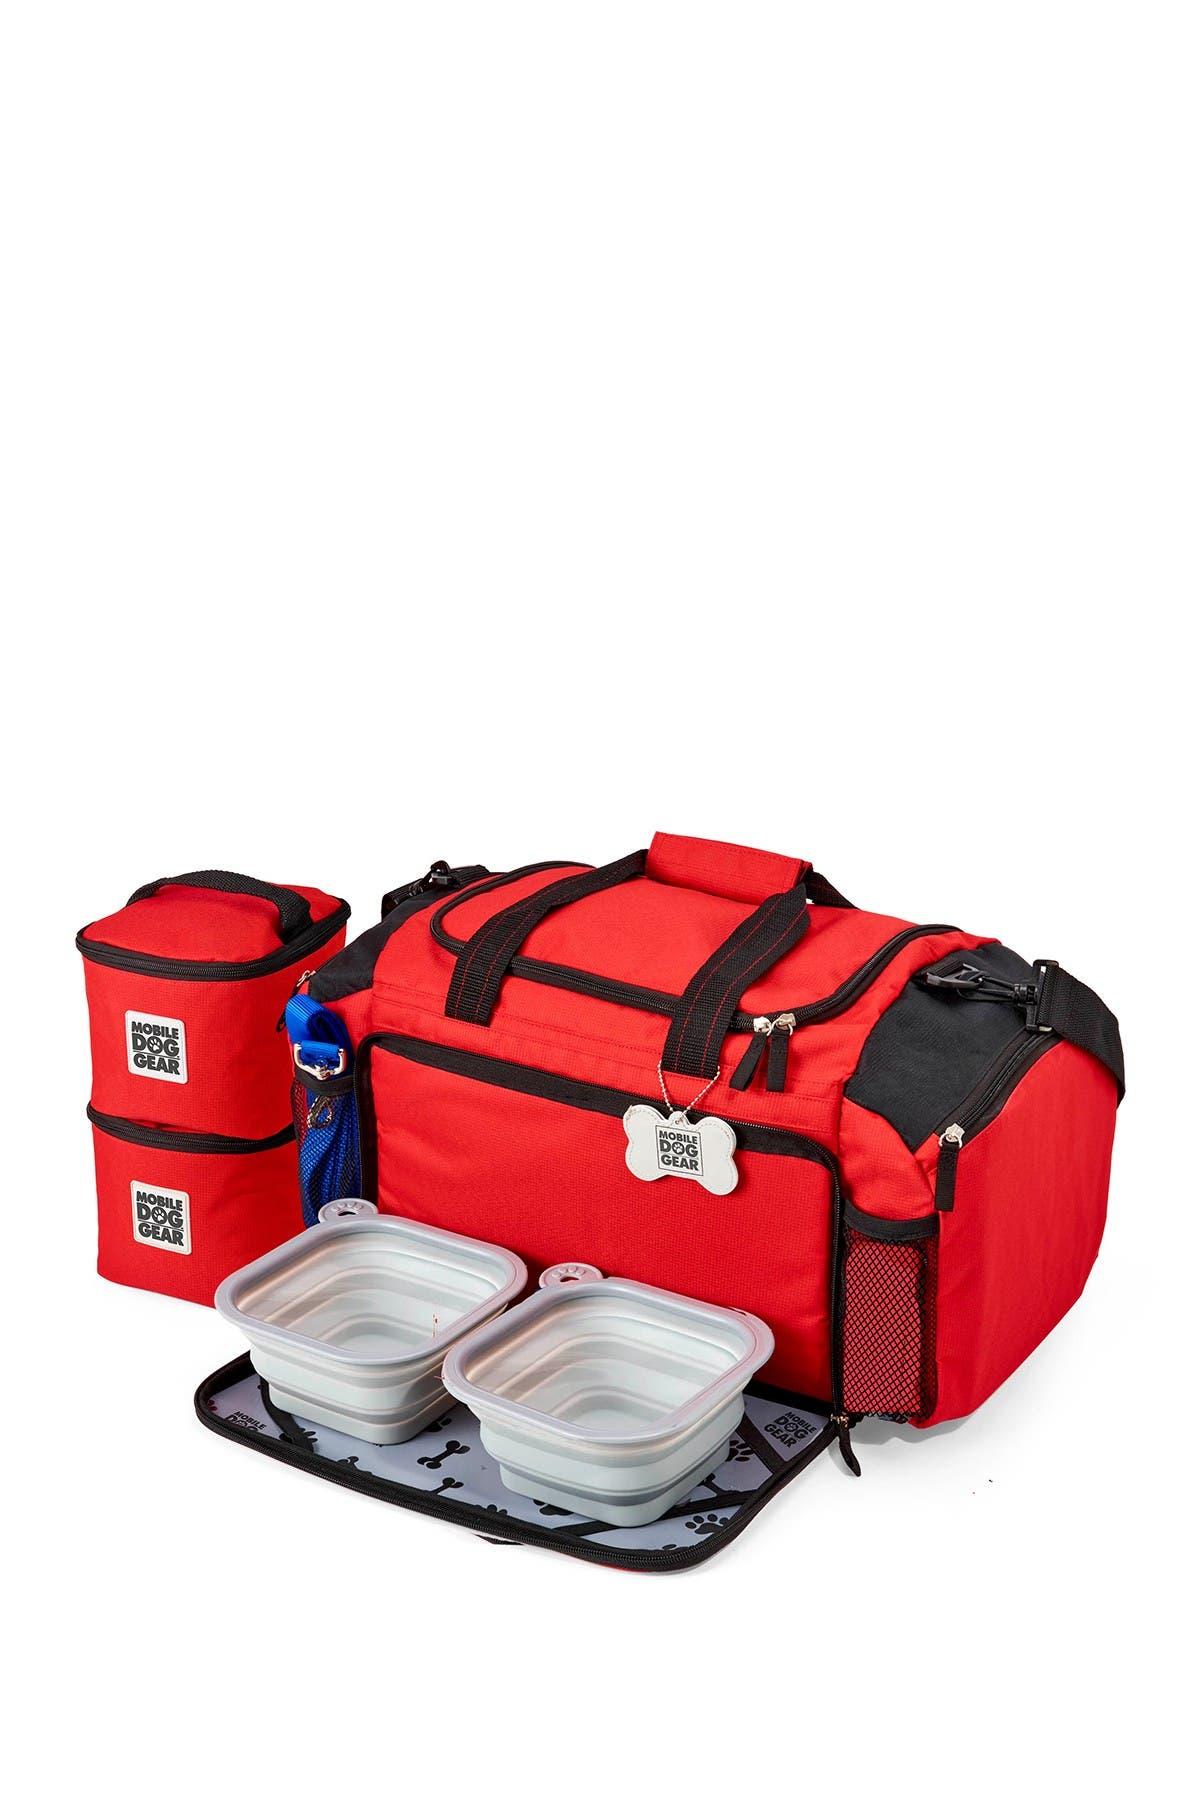 Image of MOBILE DOG GEAR Ultimate Week Away(R) Duffel Bag - Red